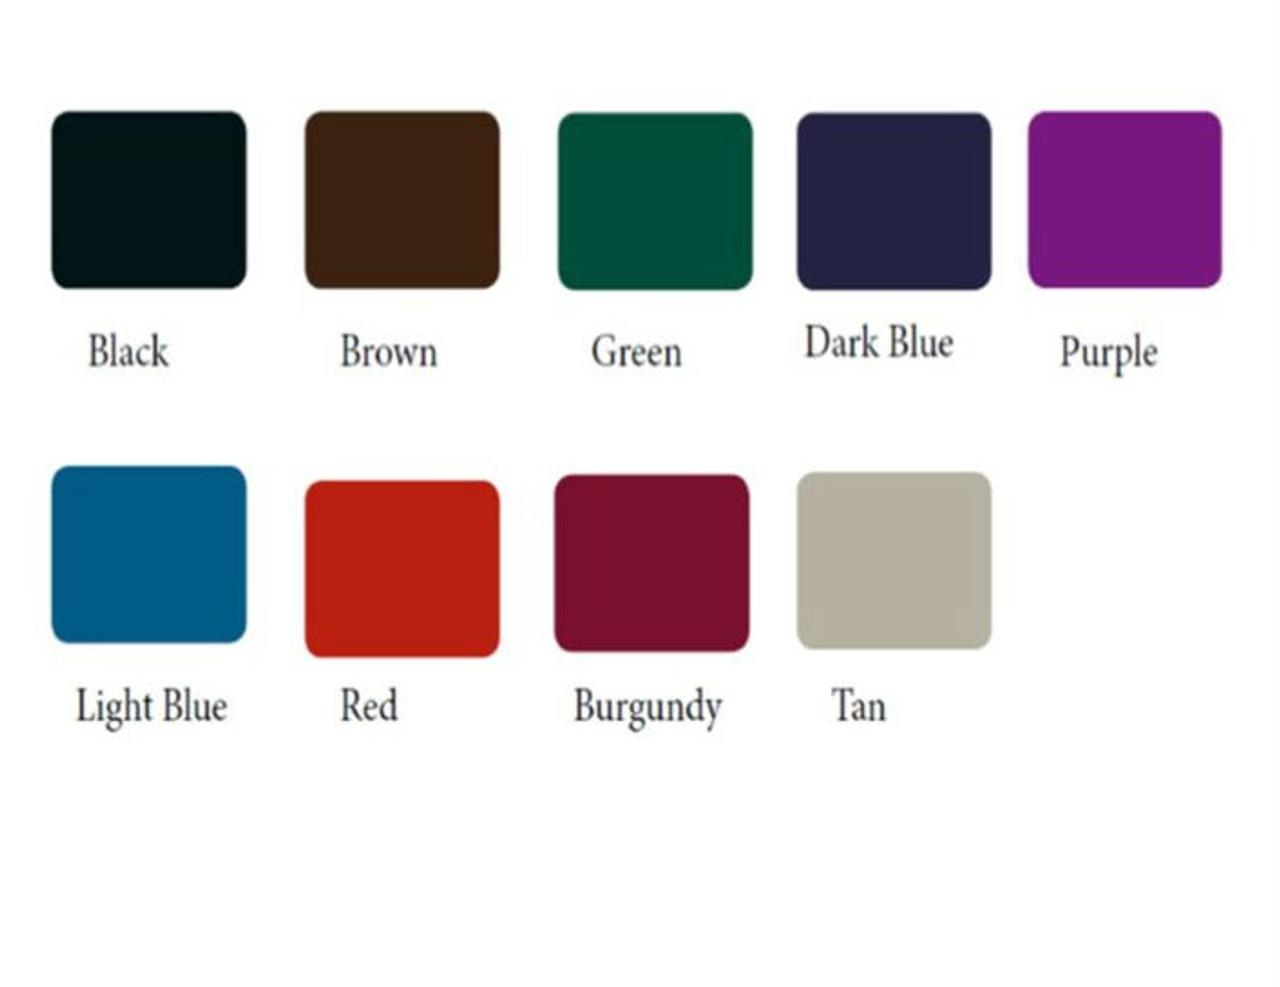 Picnic table colors